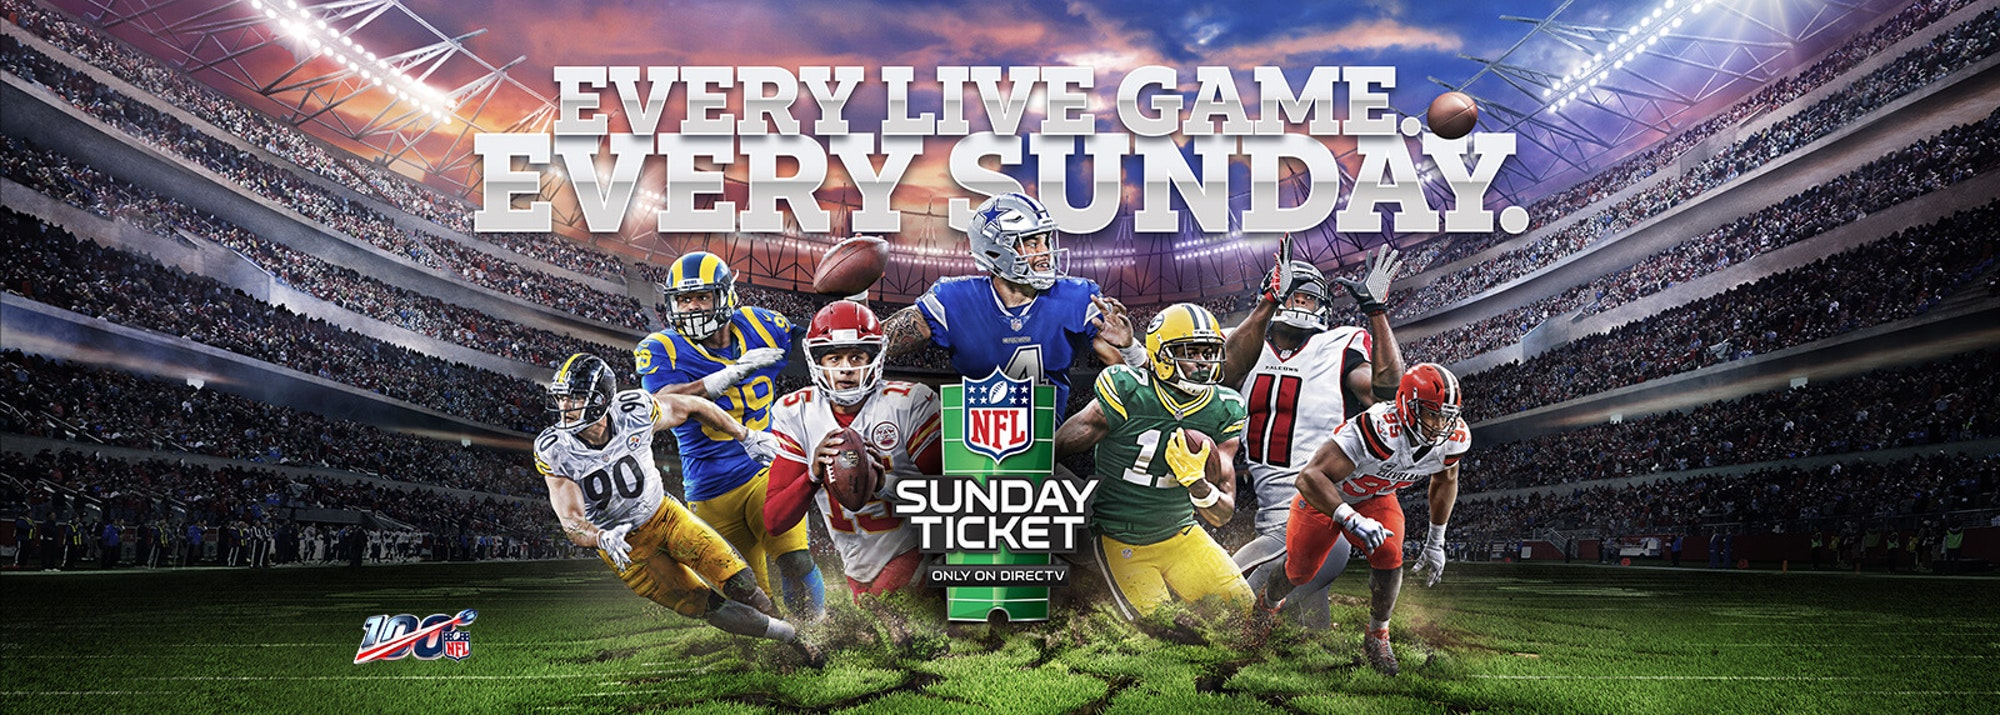 saints seawhawks nfl sunday ticket nfc streaming cbs